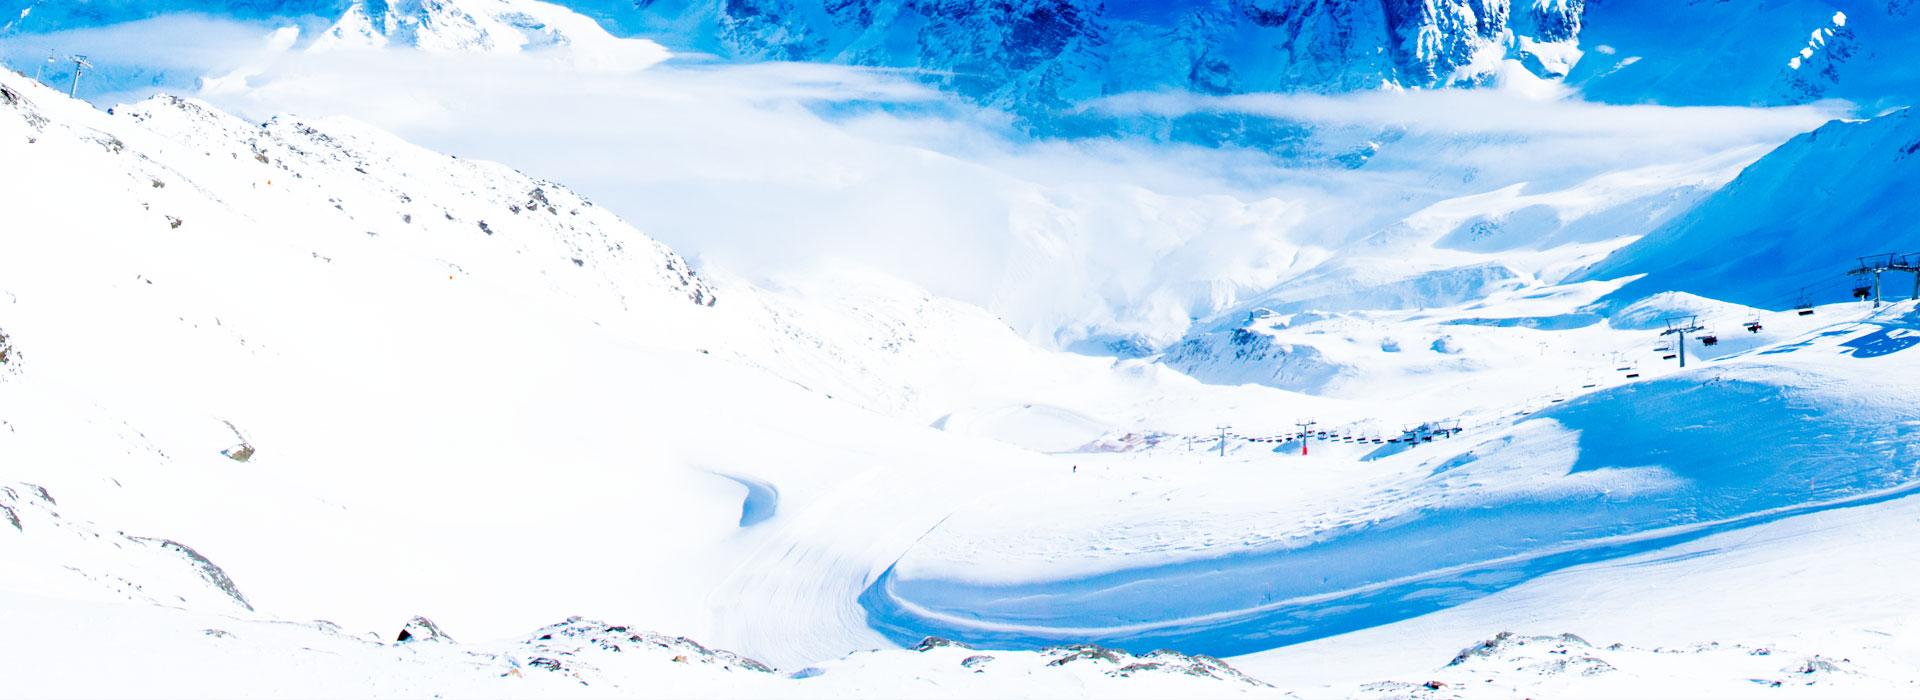 snow-bg